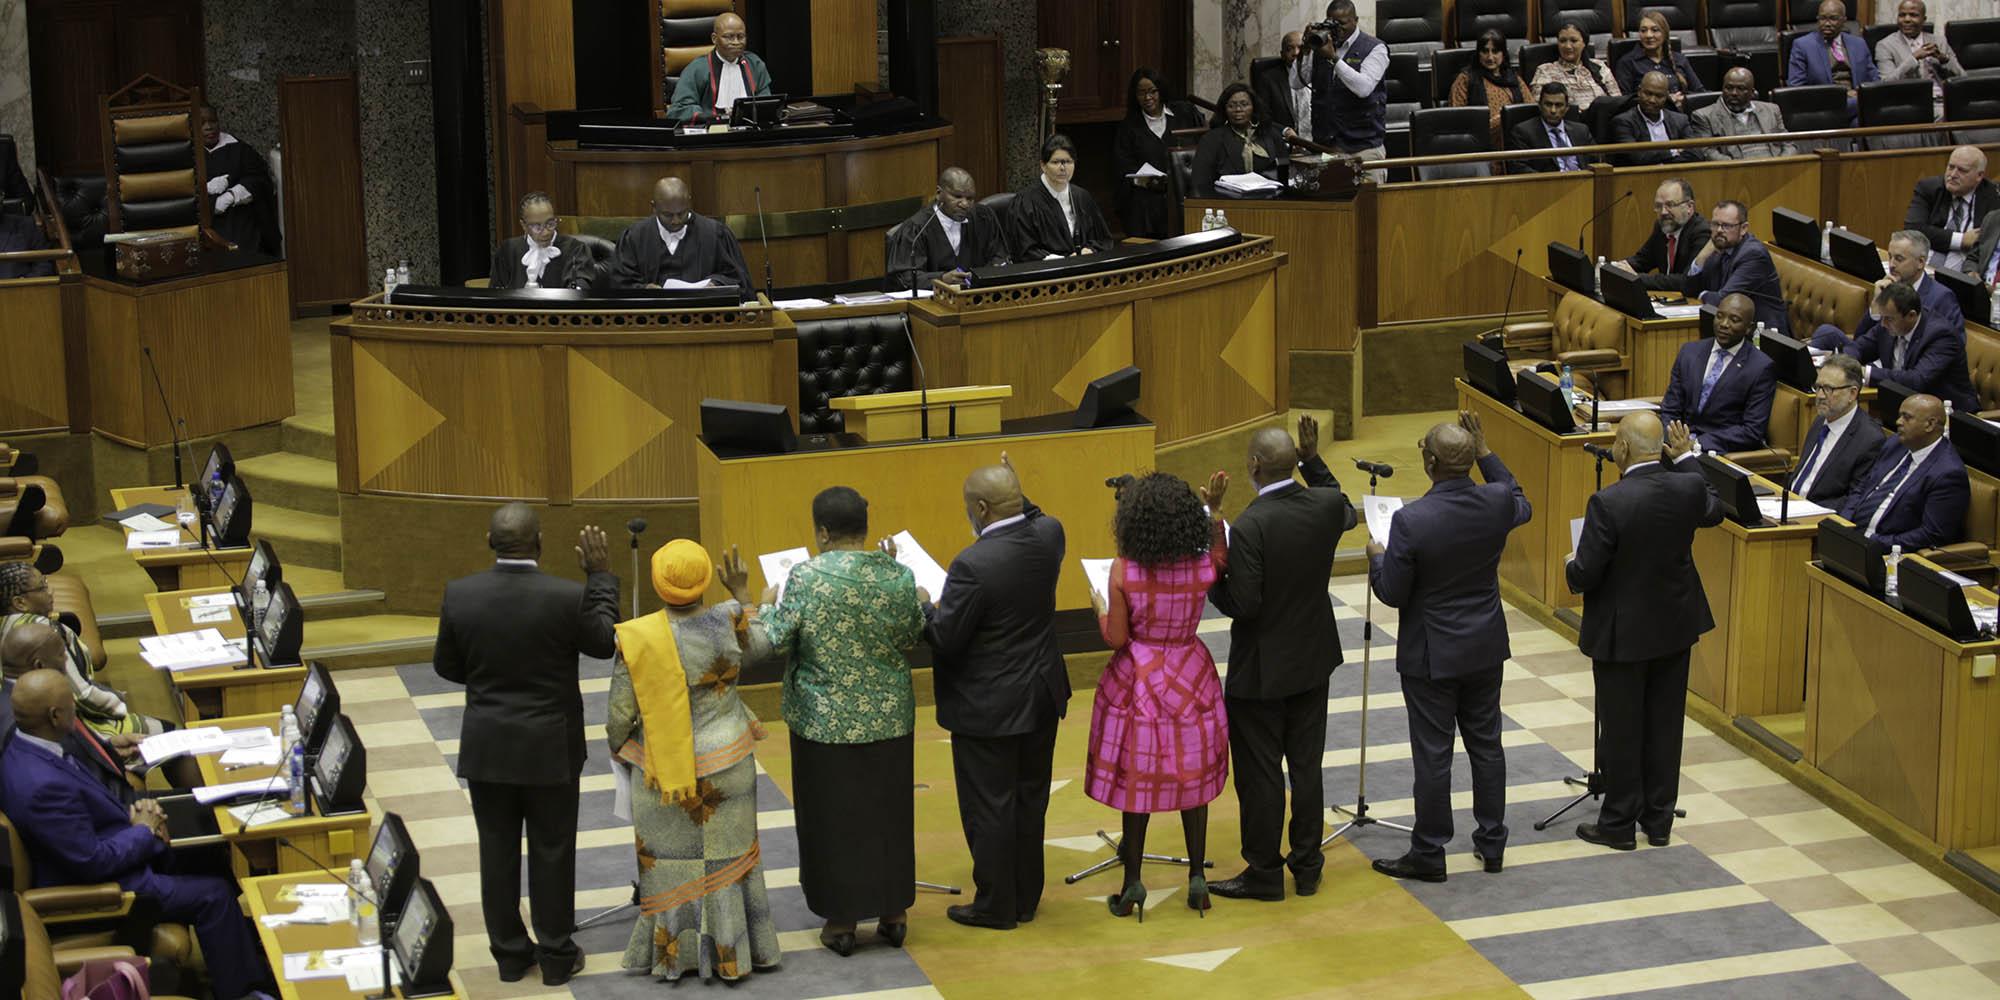 SA's 6th Parliament: High spirits, high energy as new MPs sworn in at Parliament